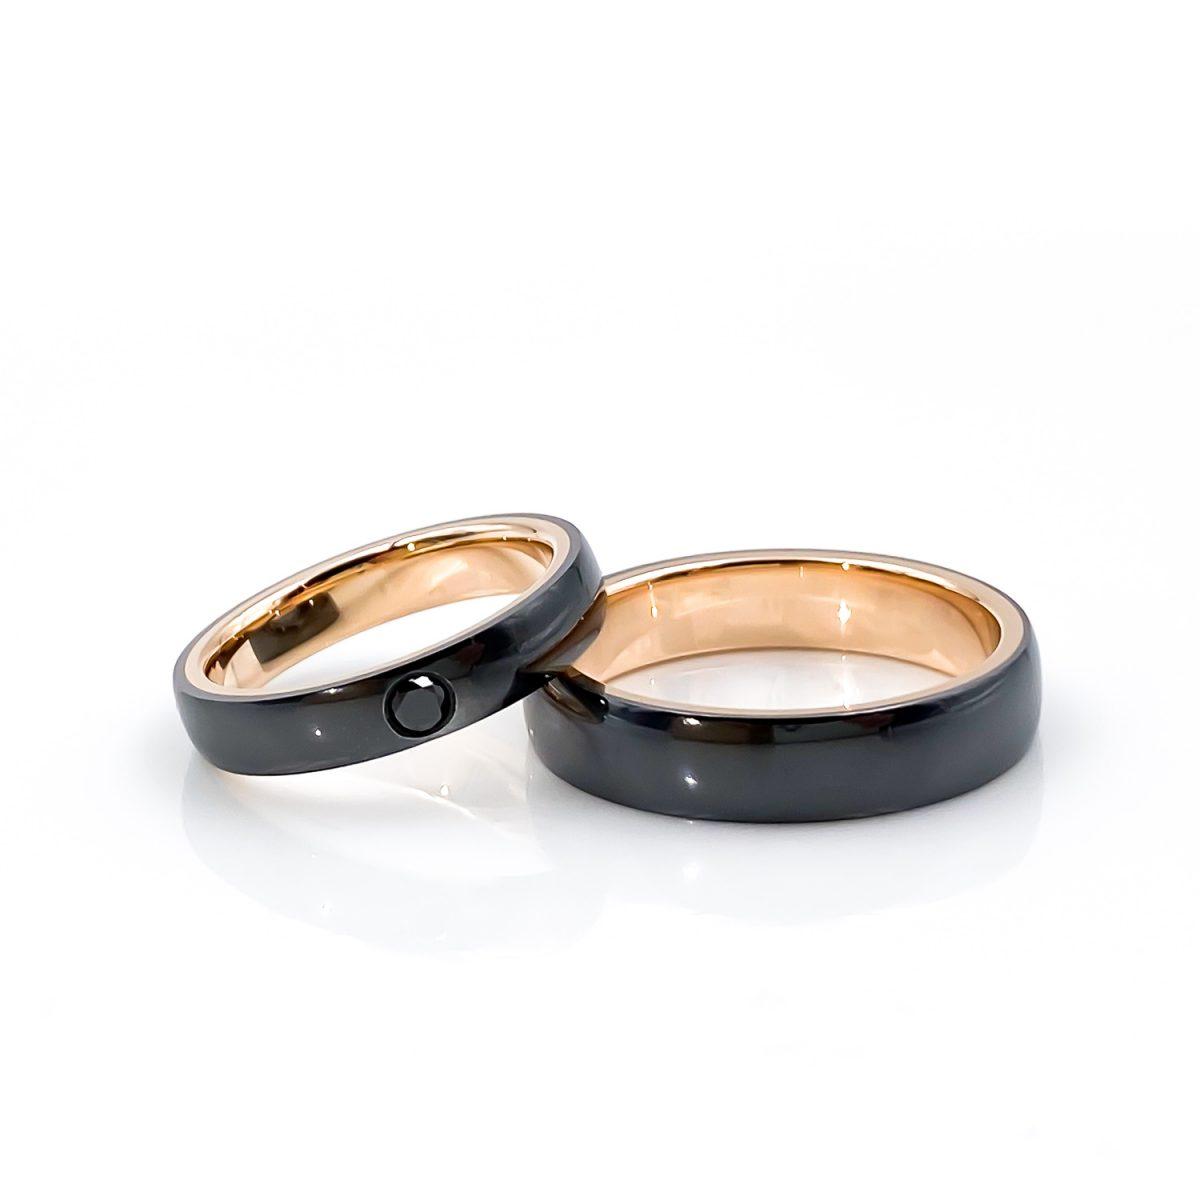 Tantal Eheringe Ringpaar aus Tantal True Love Collection No.51